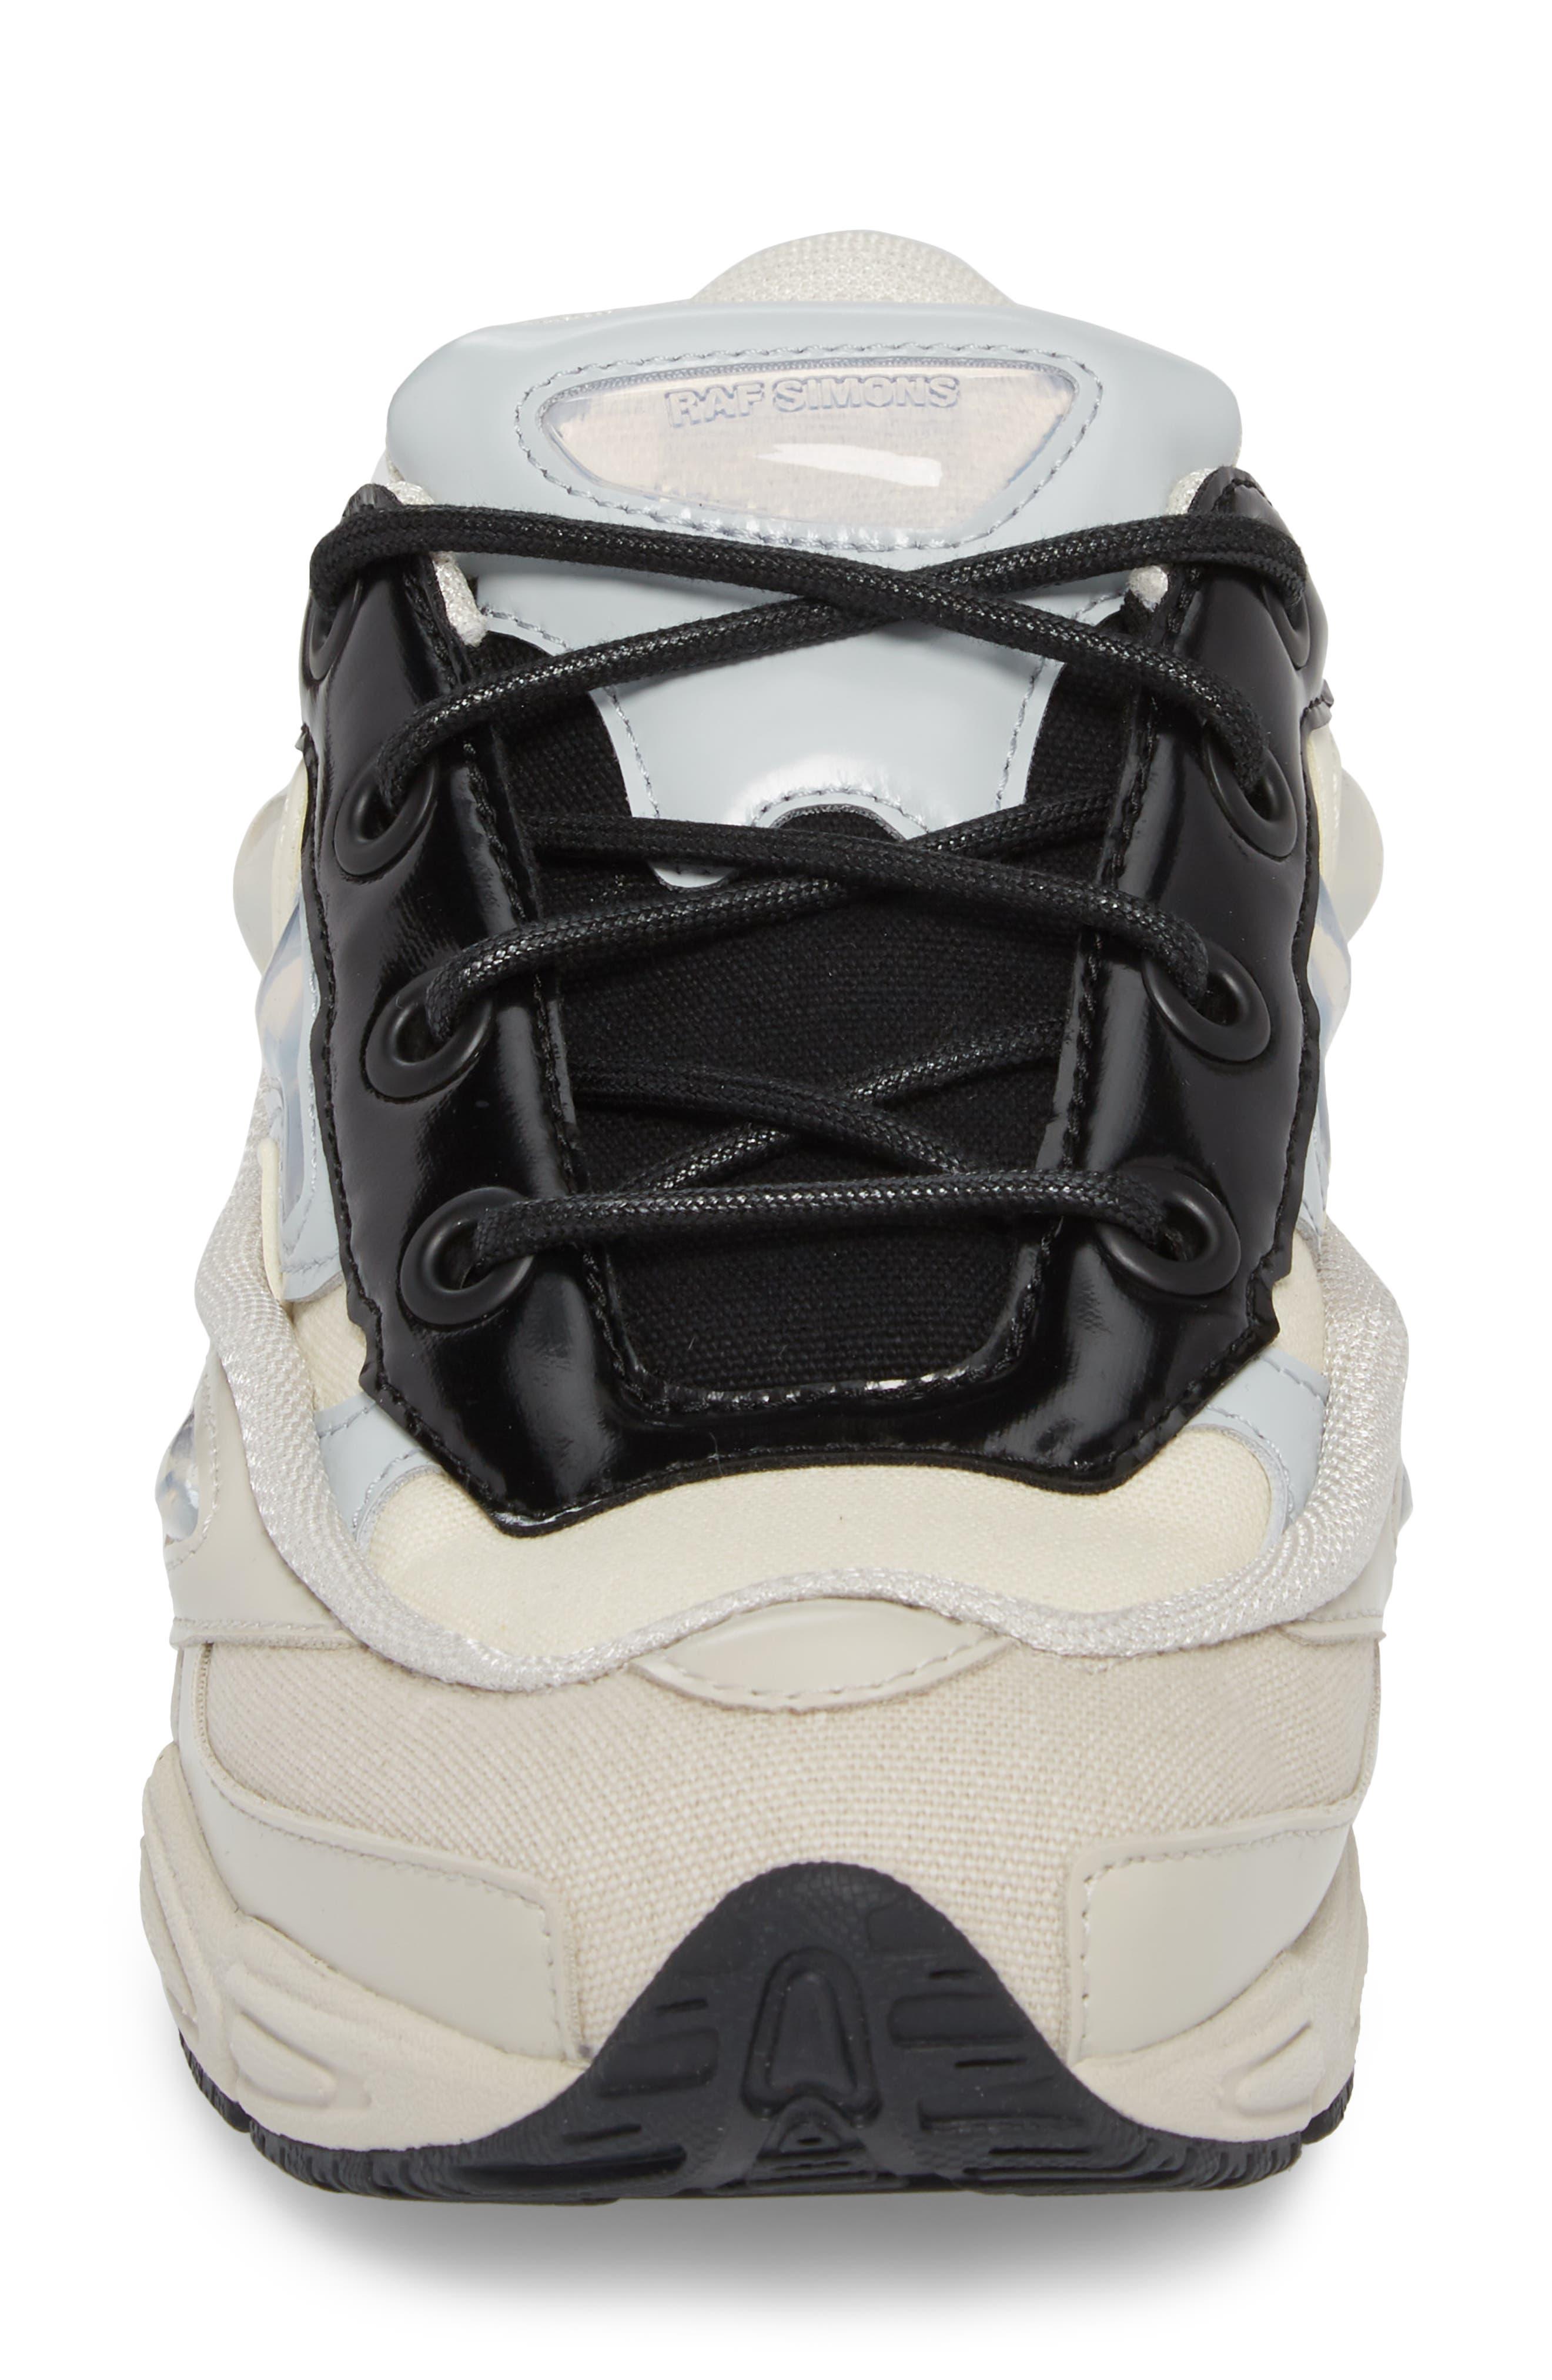 adidas by Raf Simons Ozweego III Sneaker,                             Alternate thumbnail 4, color,                             Cream White/ Mist Stone/ Black